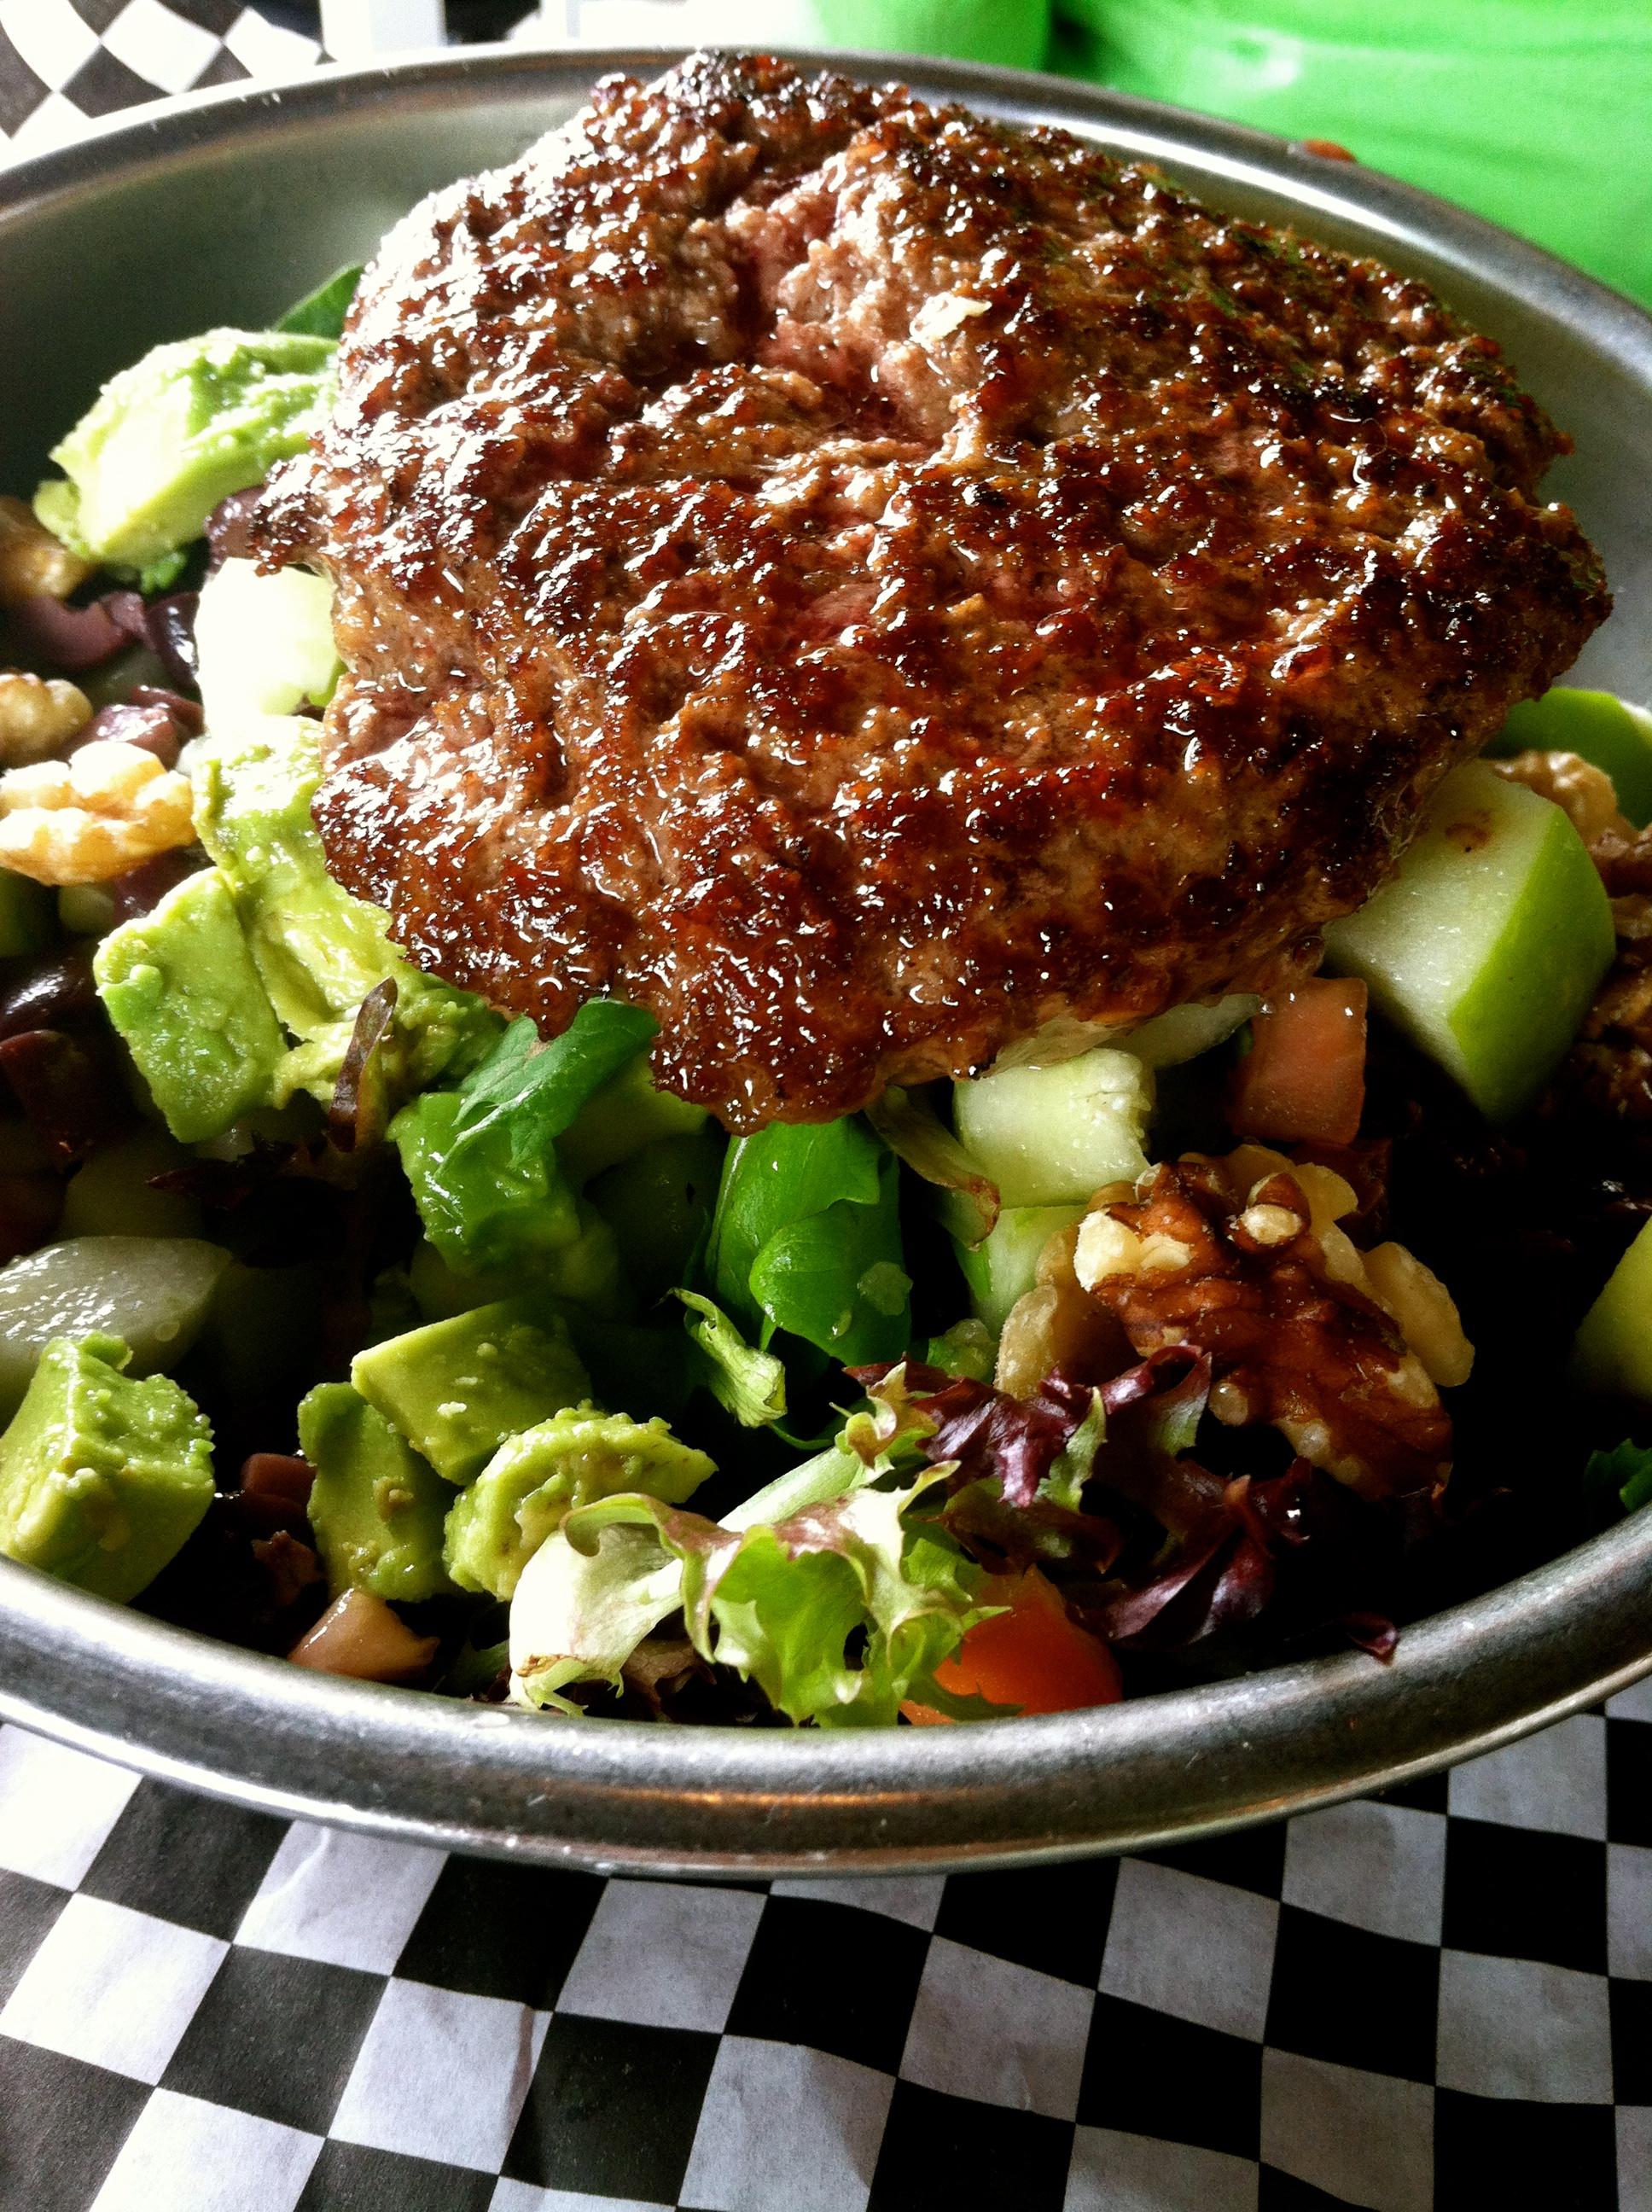 bad daddy's big salad CYO with a burger